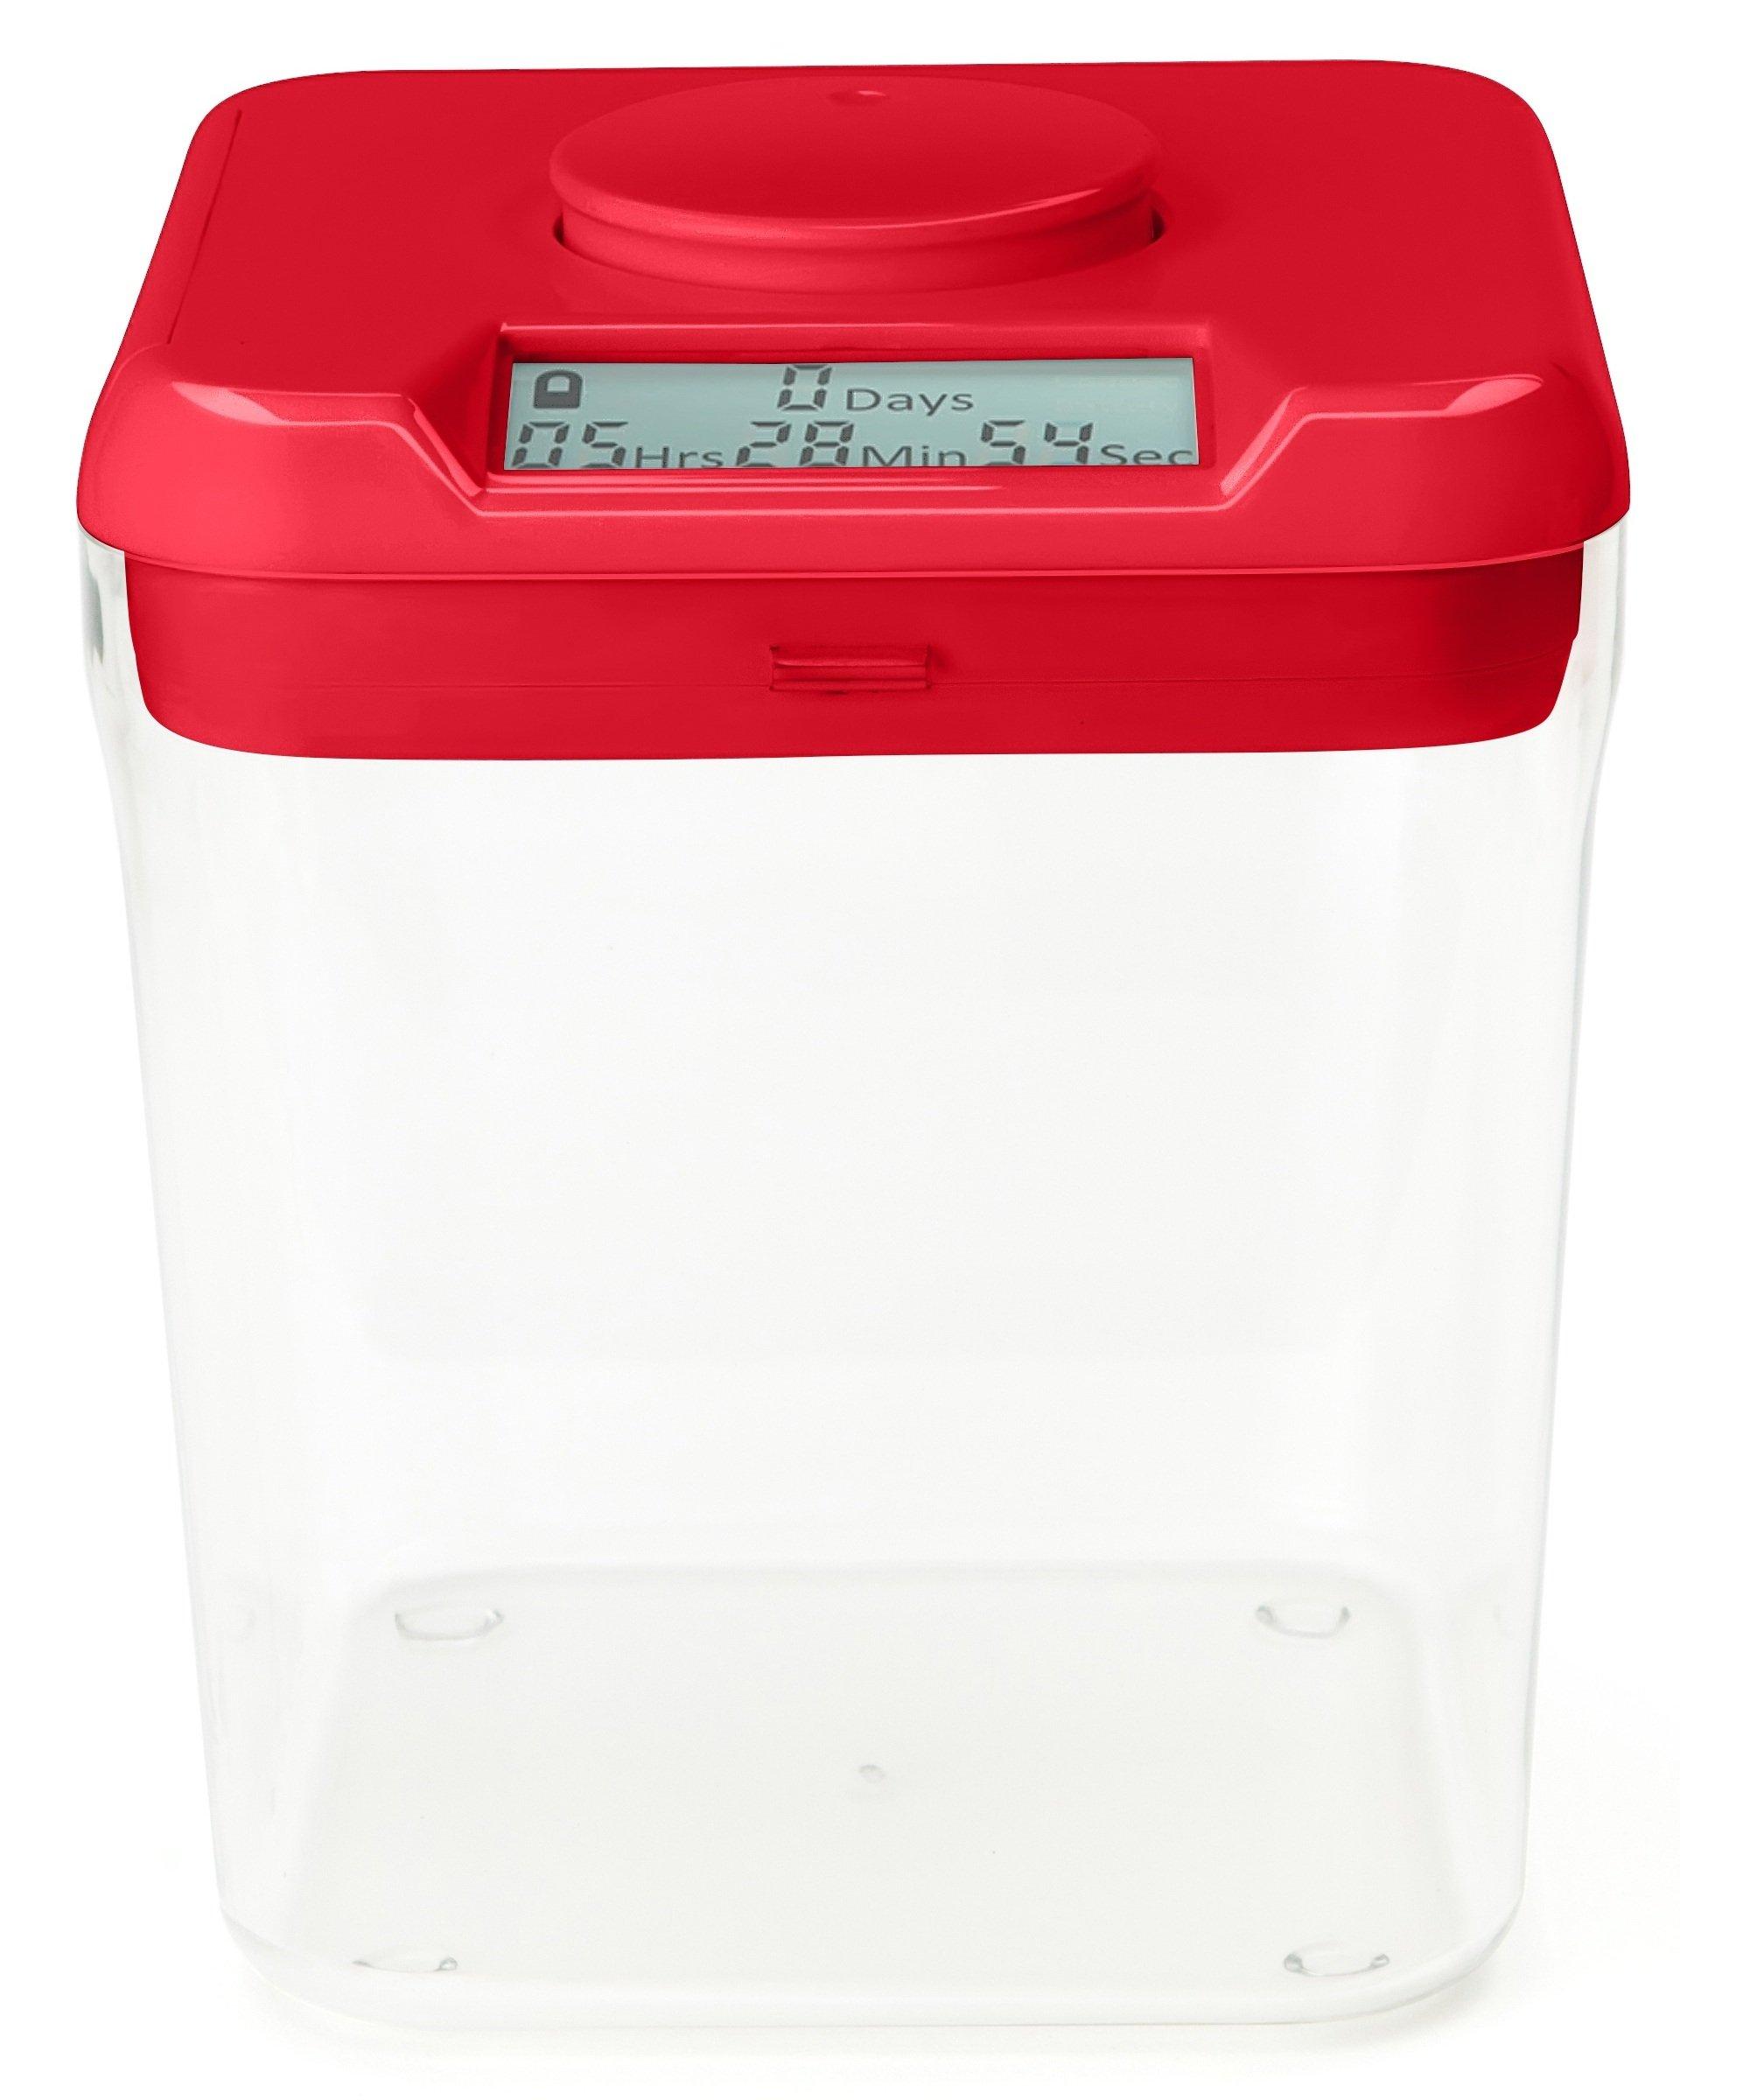 Amazon Com Kitchen Safe Kitchen Safe Time Locking Container